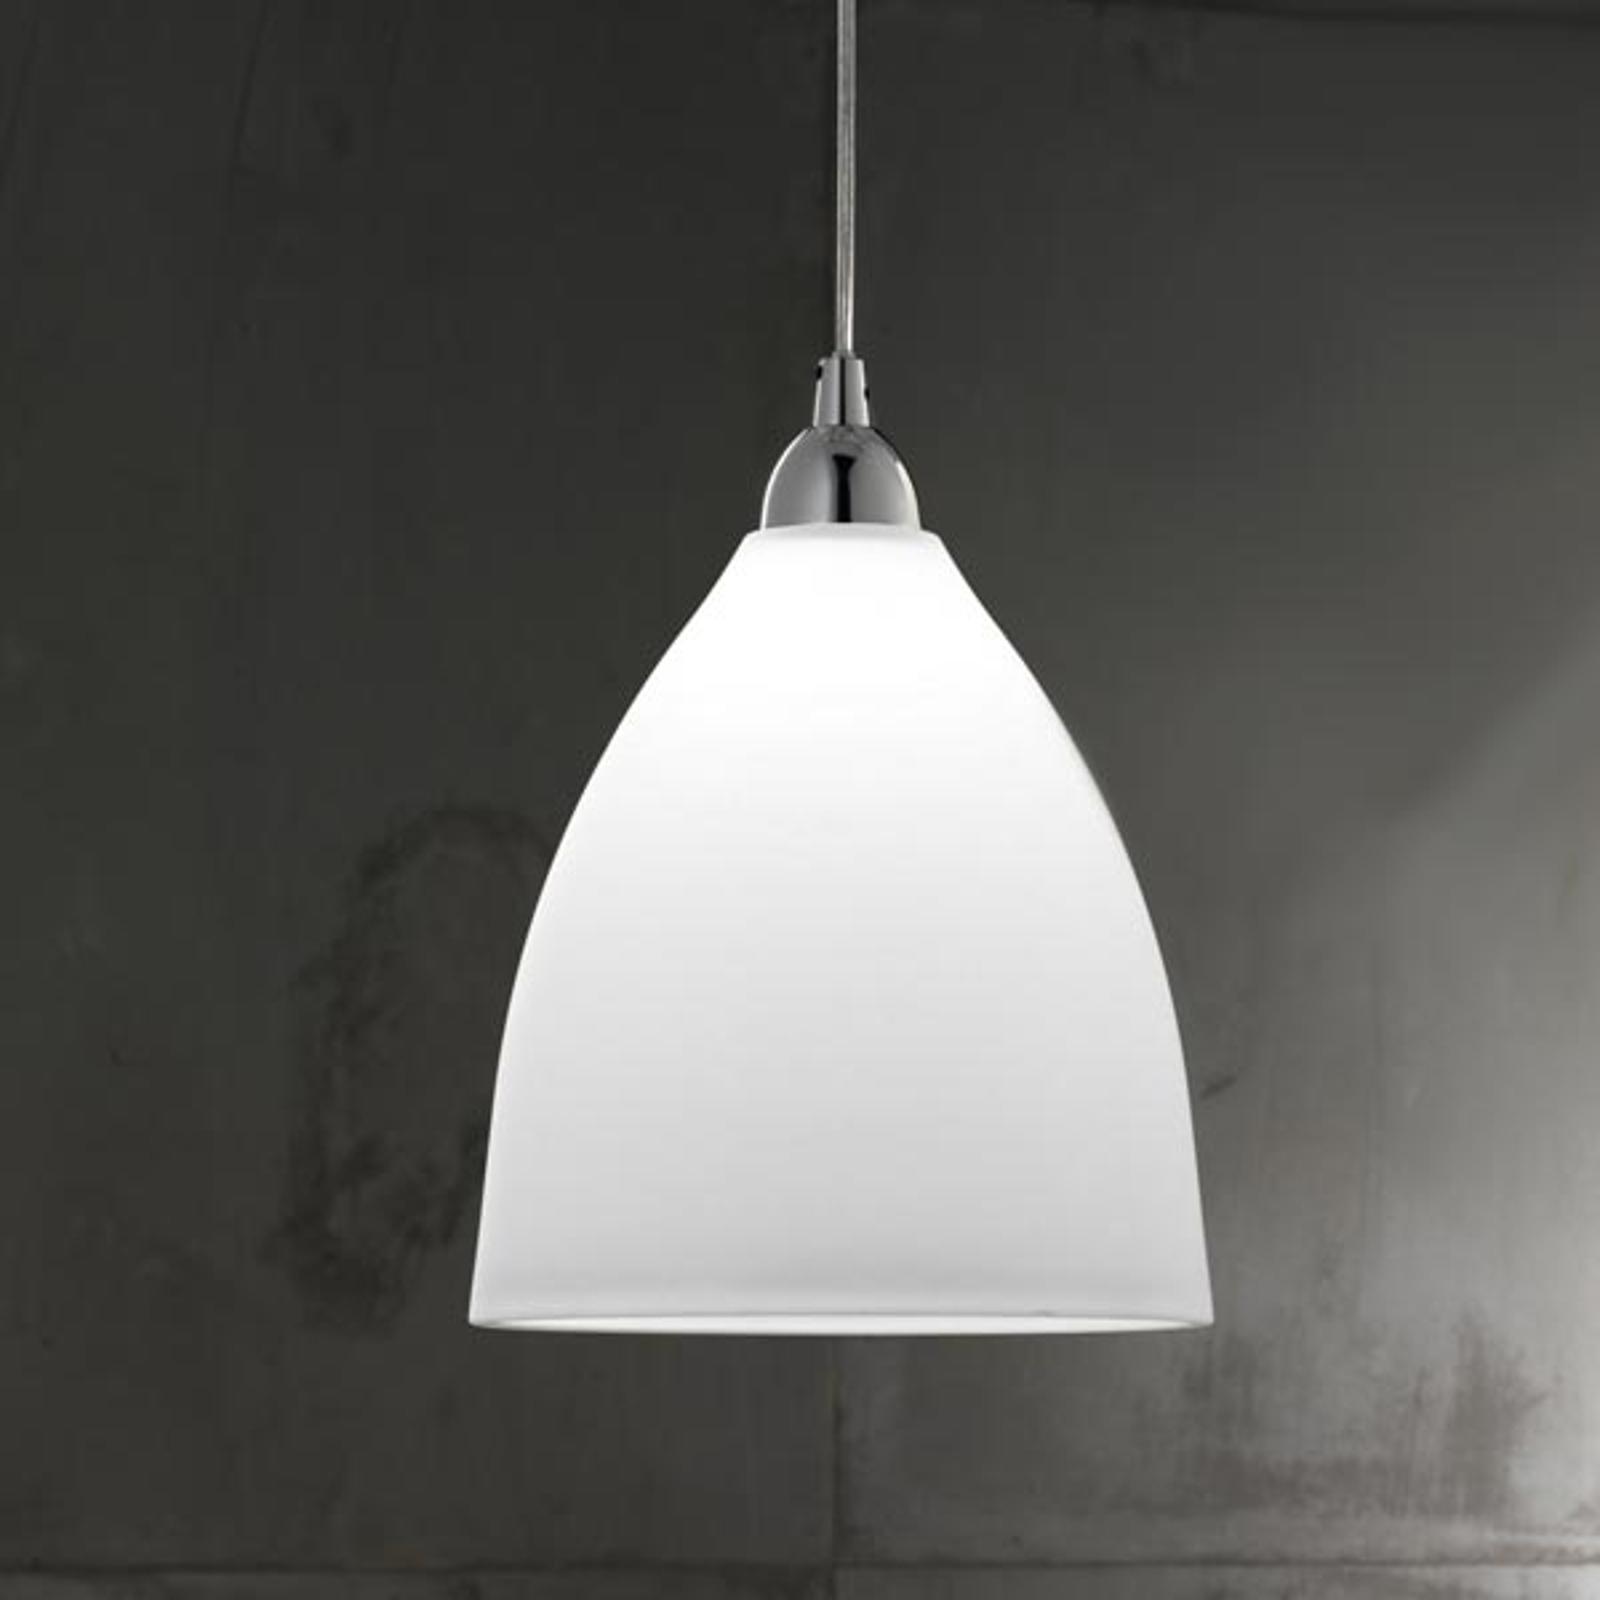 Glass pendant light PROVENZA_3501747_1